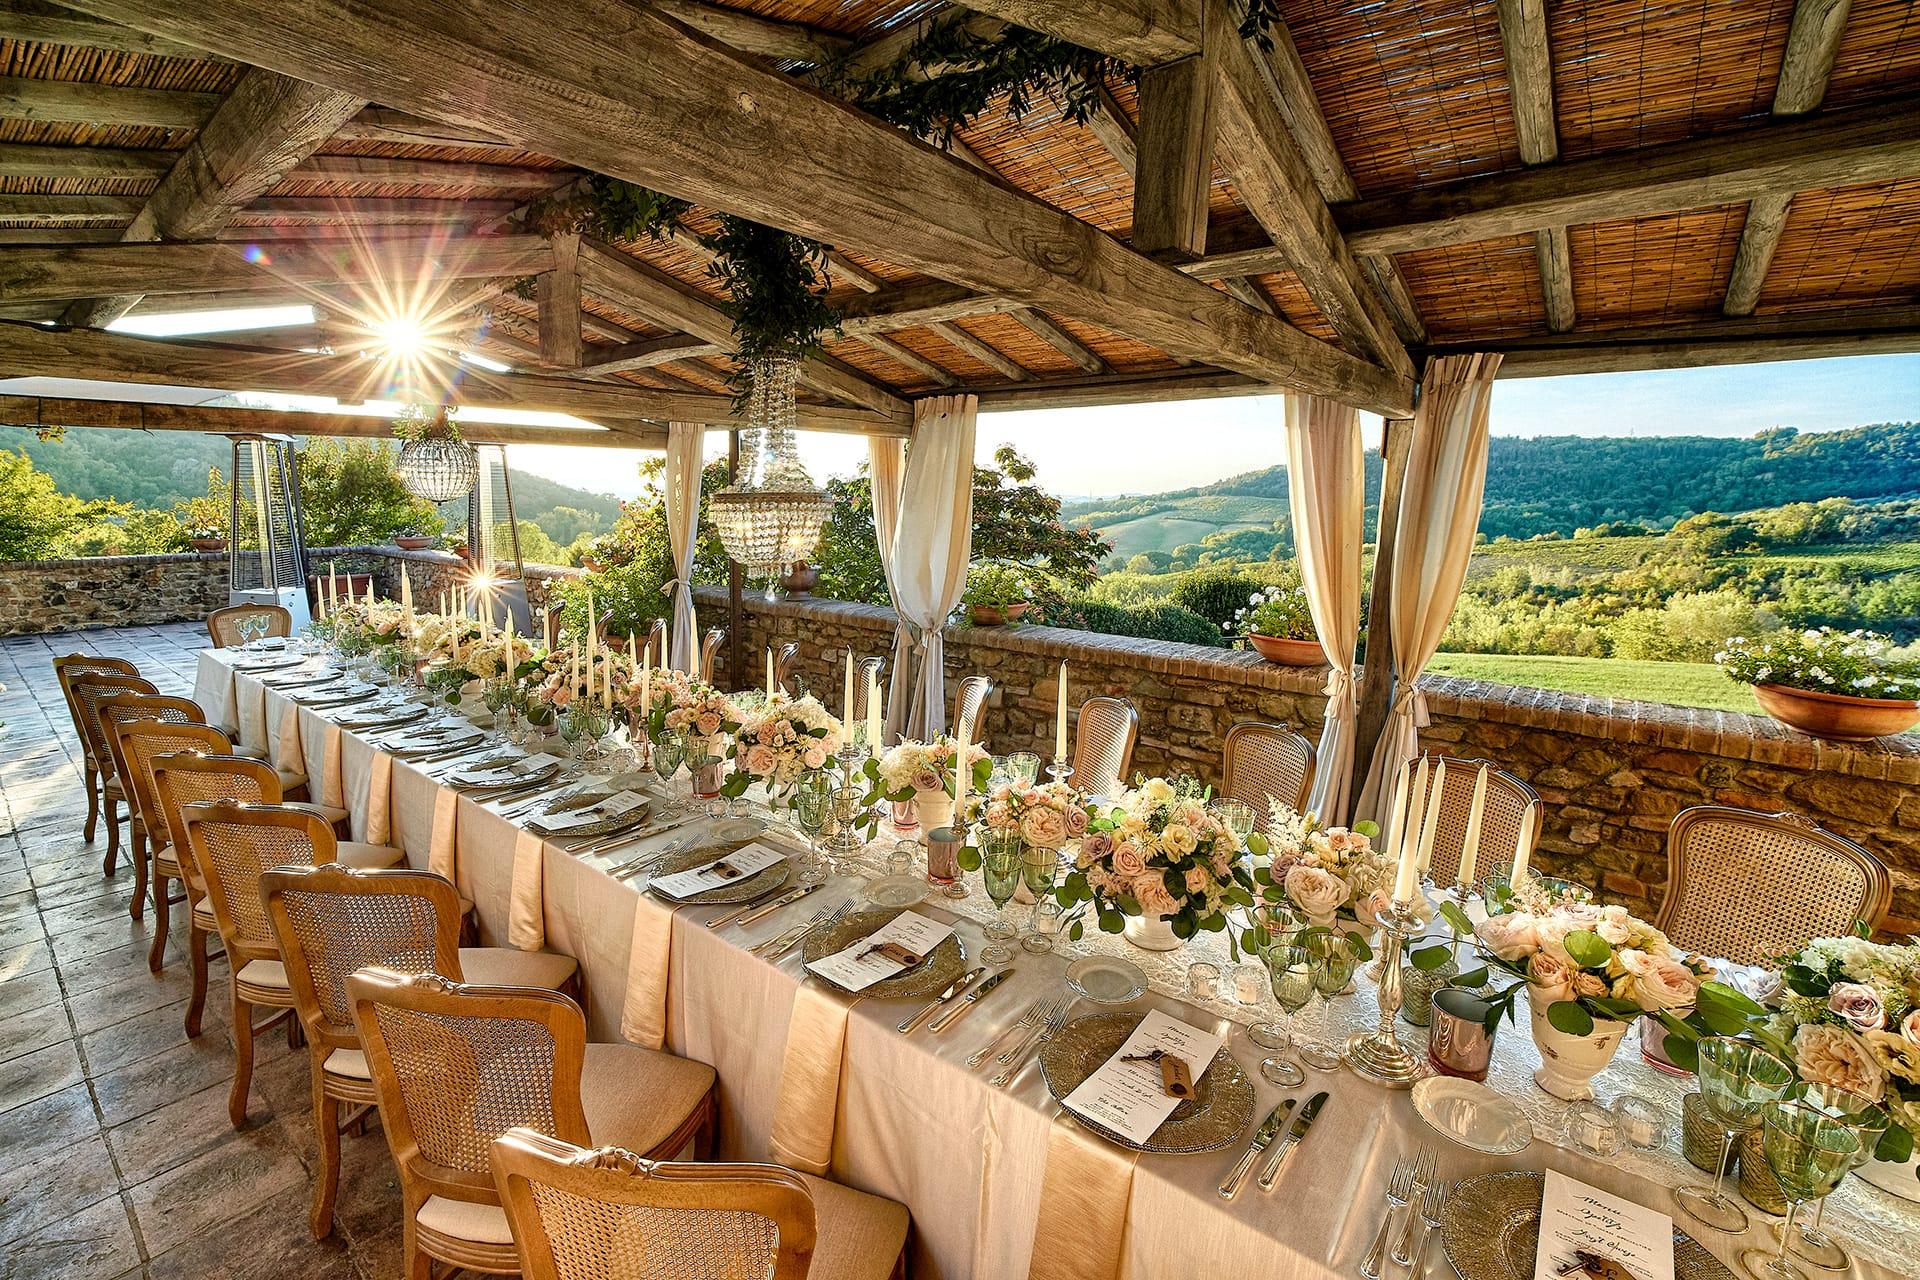 Arredamento Shabby Toscana preludio noleggio – noleggio attrezzature per catering